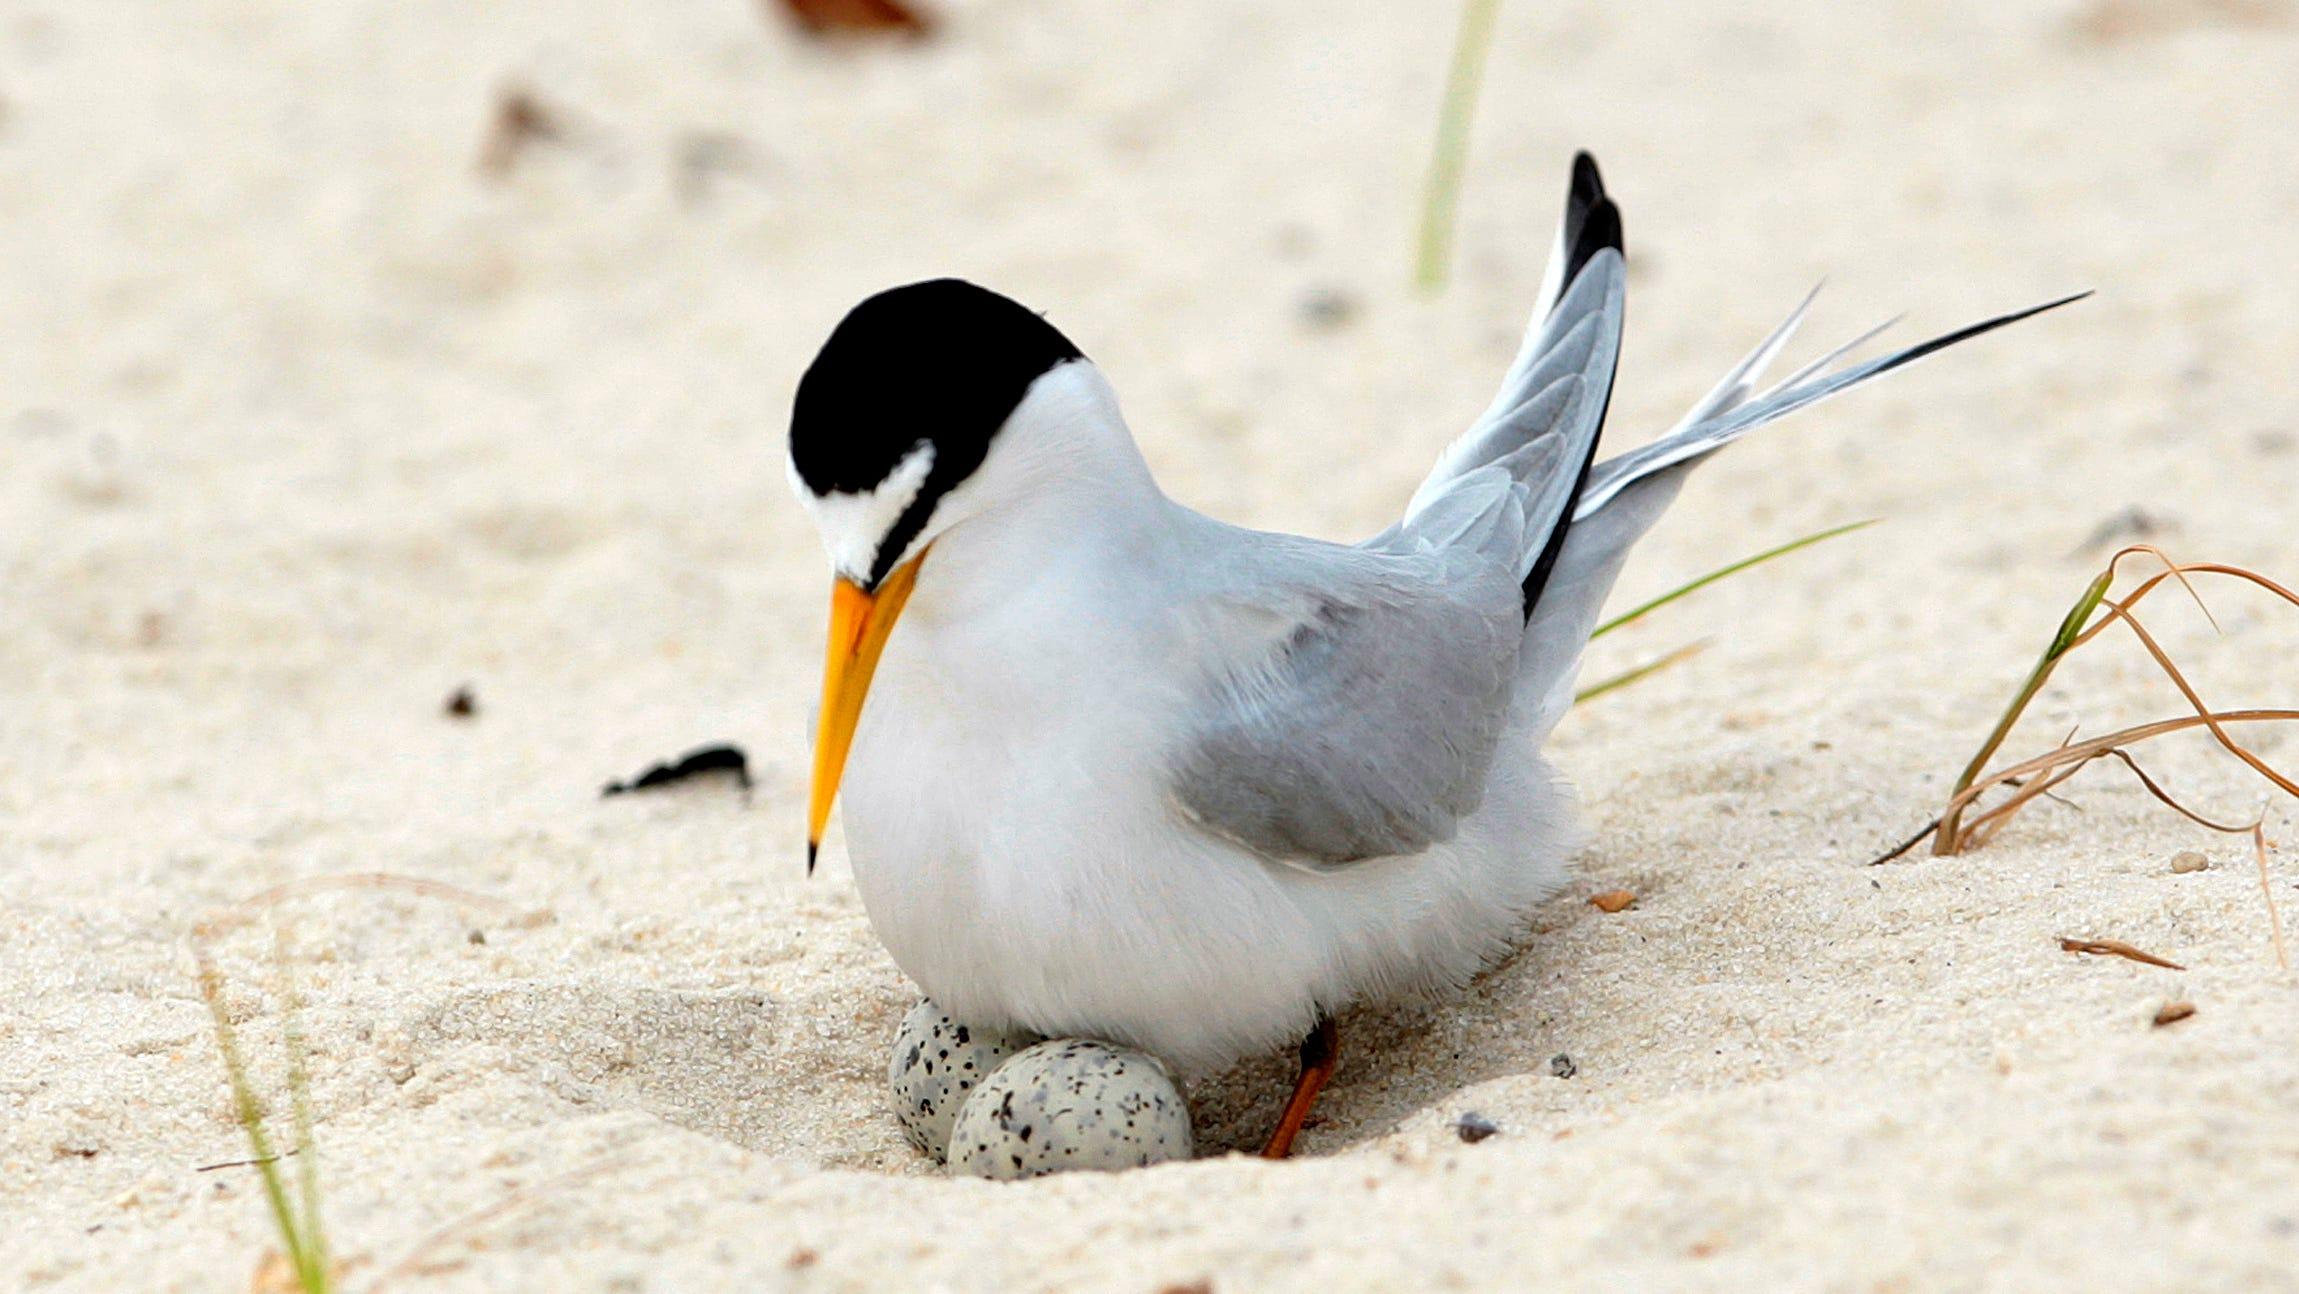 Interior least tern off endangered species list after near extinction